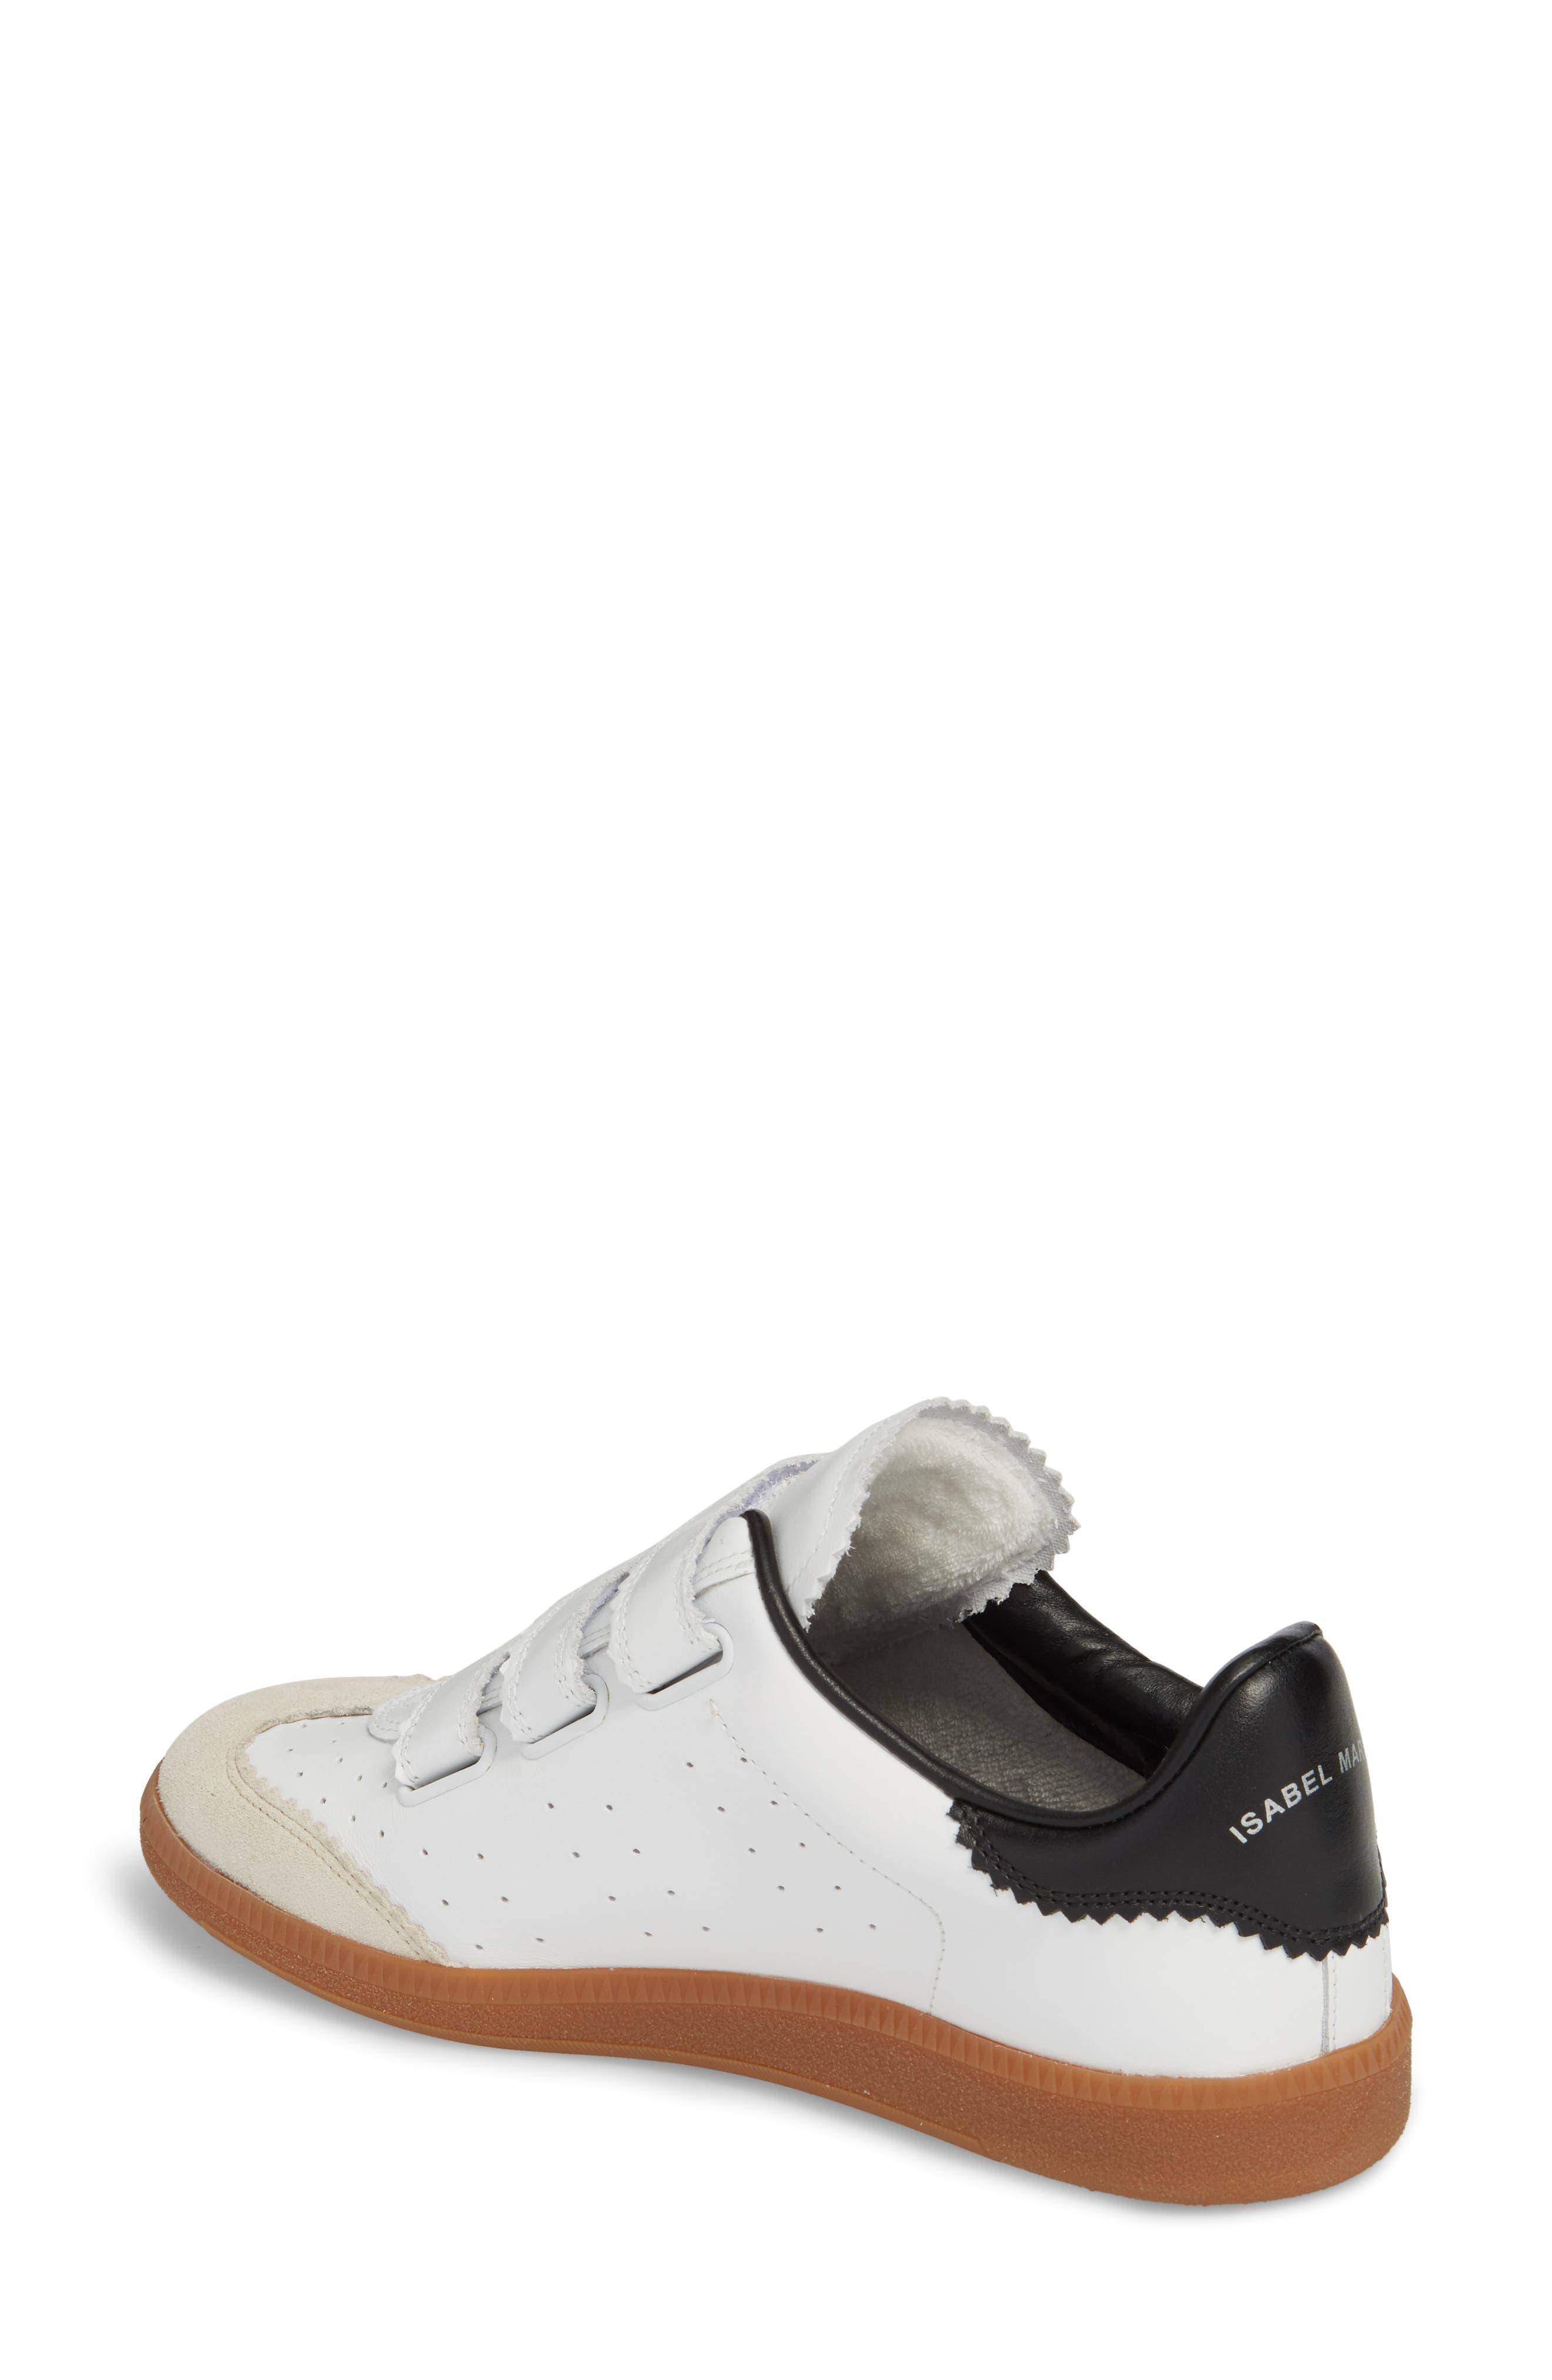 Isabel Marant Beth Low Top Sneaker,                             Alternate thumbnail 2, color,                             WHITE